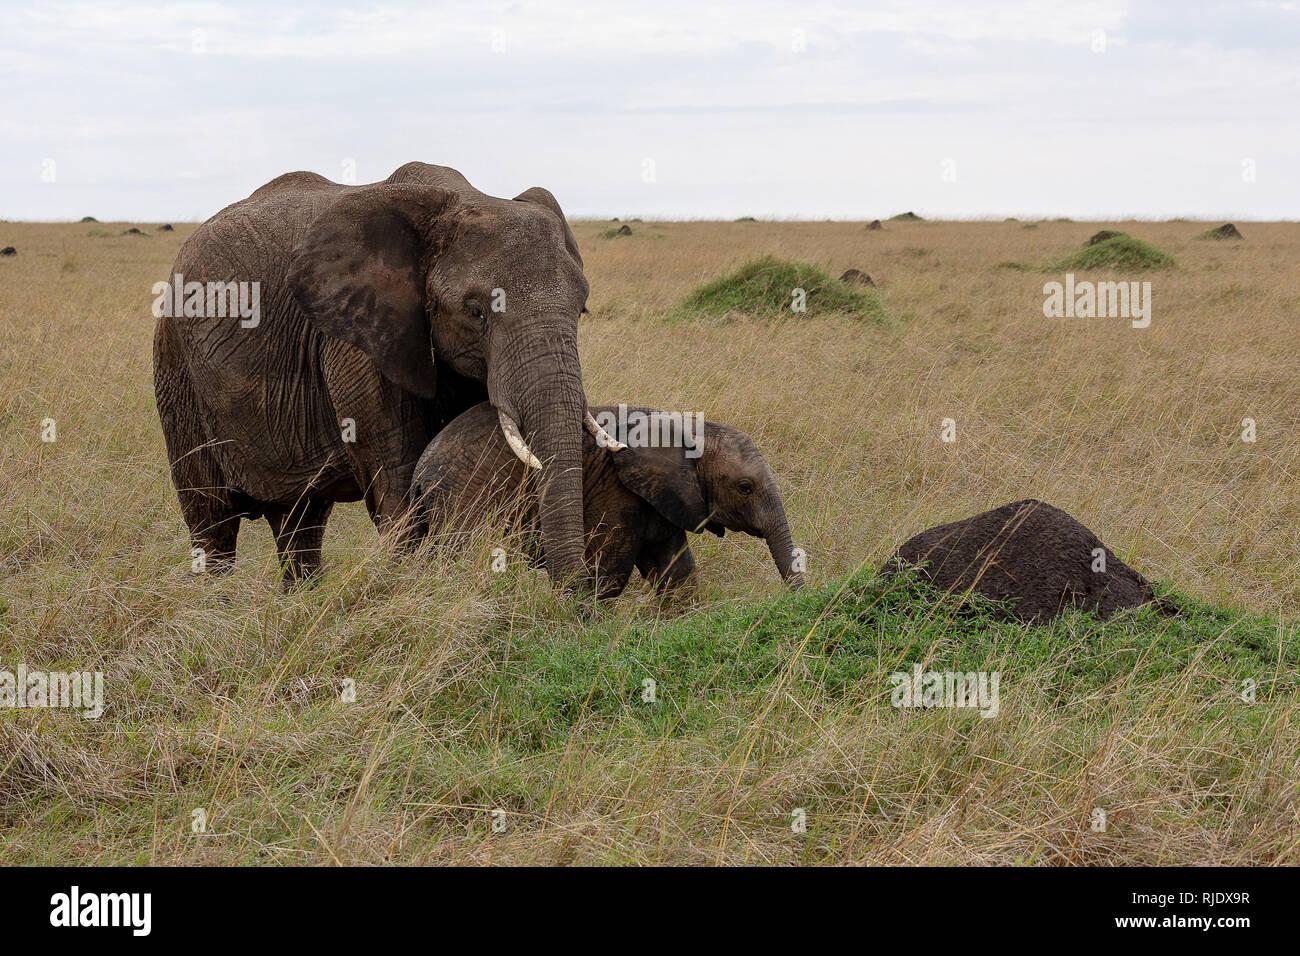 African elephant in Kenya, Africa - Stock Image